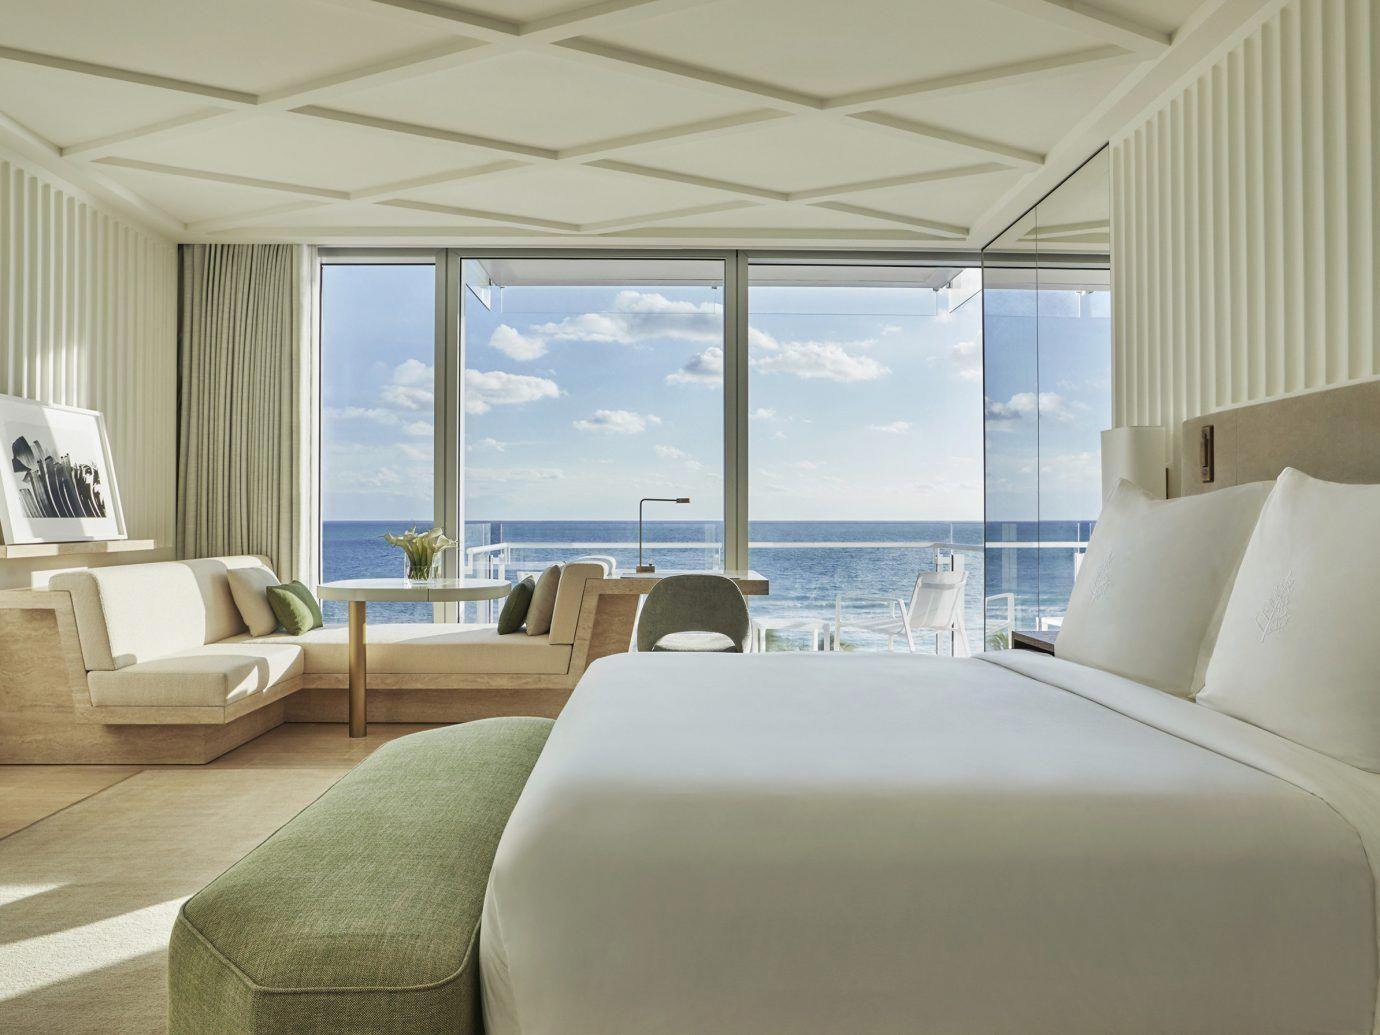 City Hotels Luxury Miami Miami Beach Indoor Window Sofa Room Floor